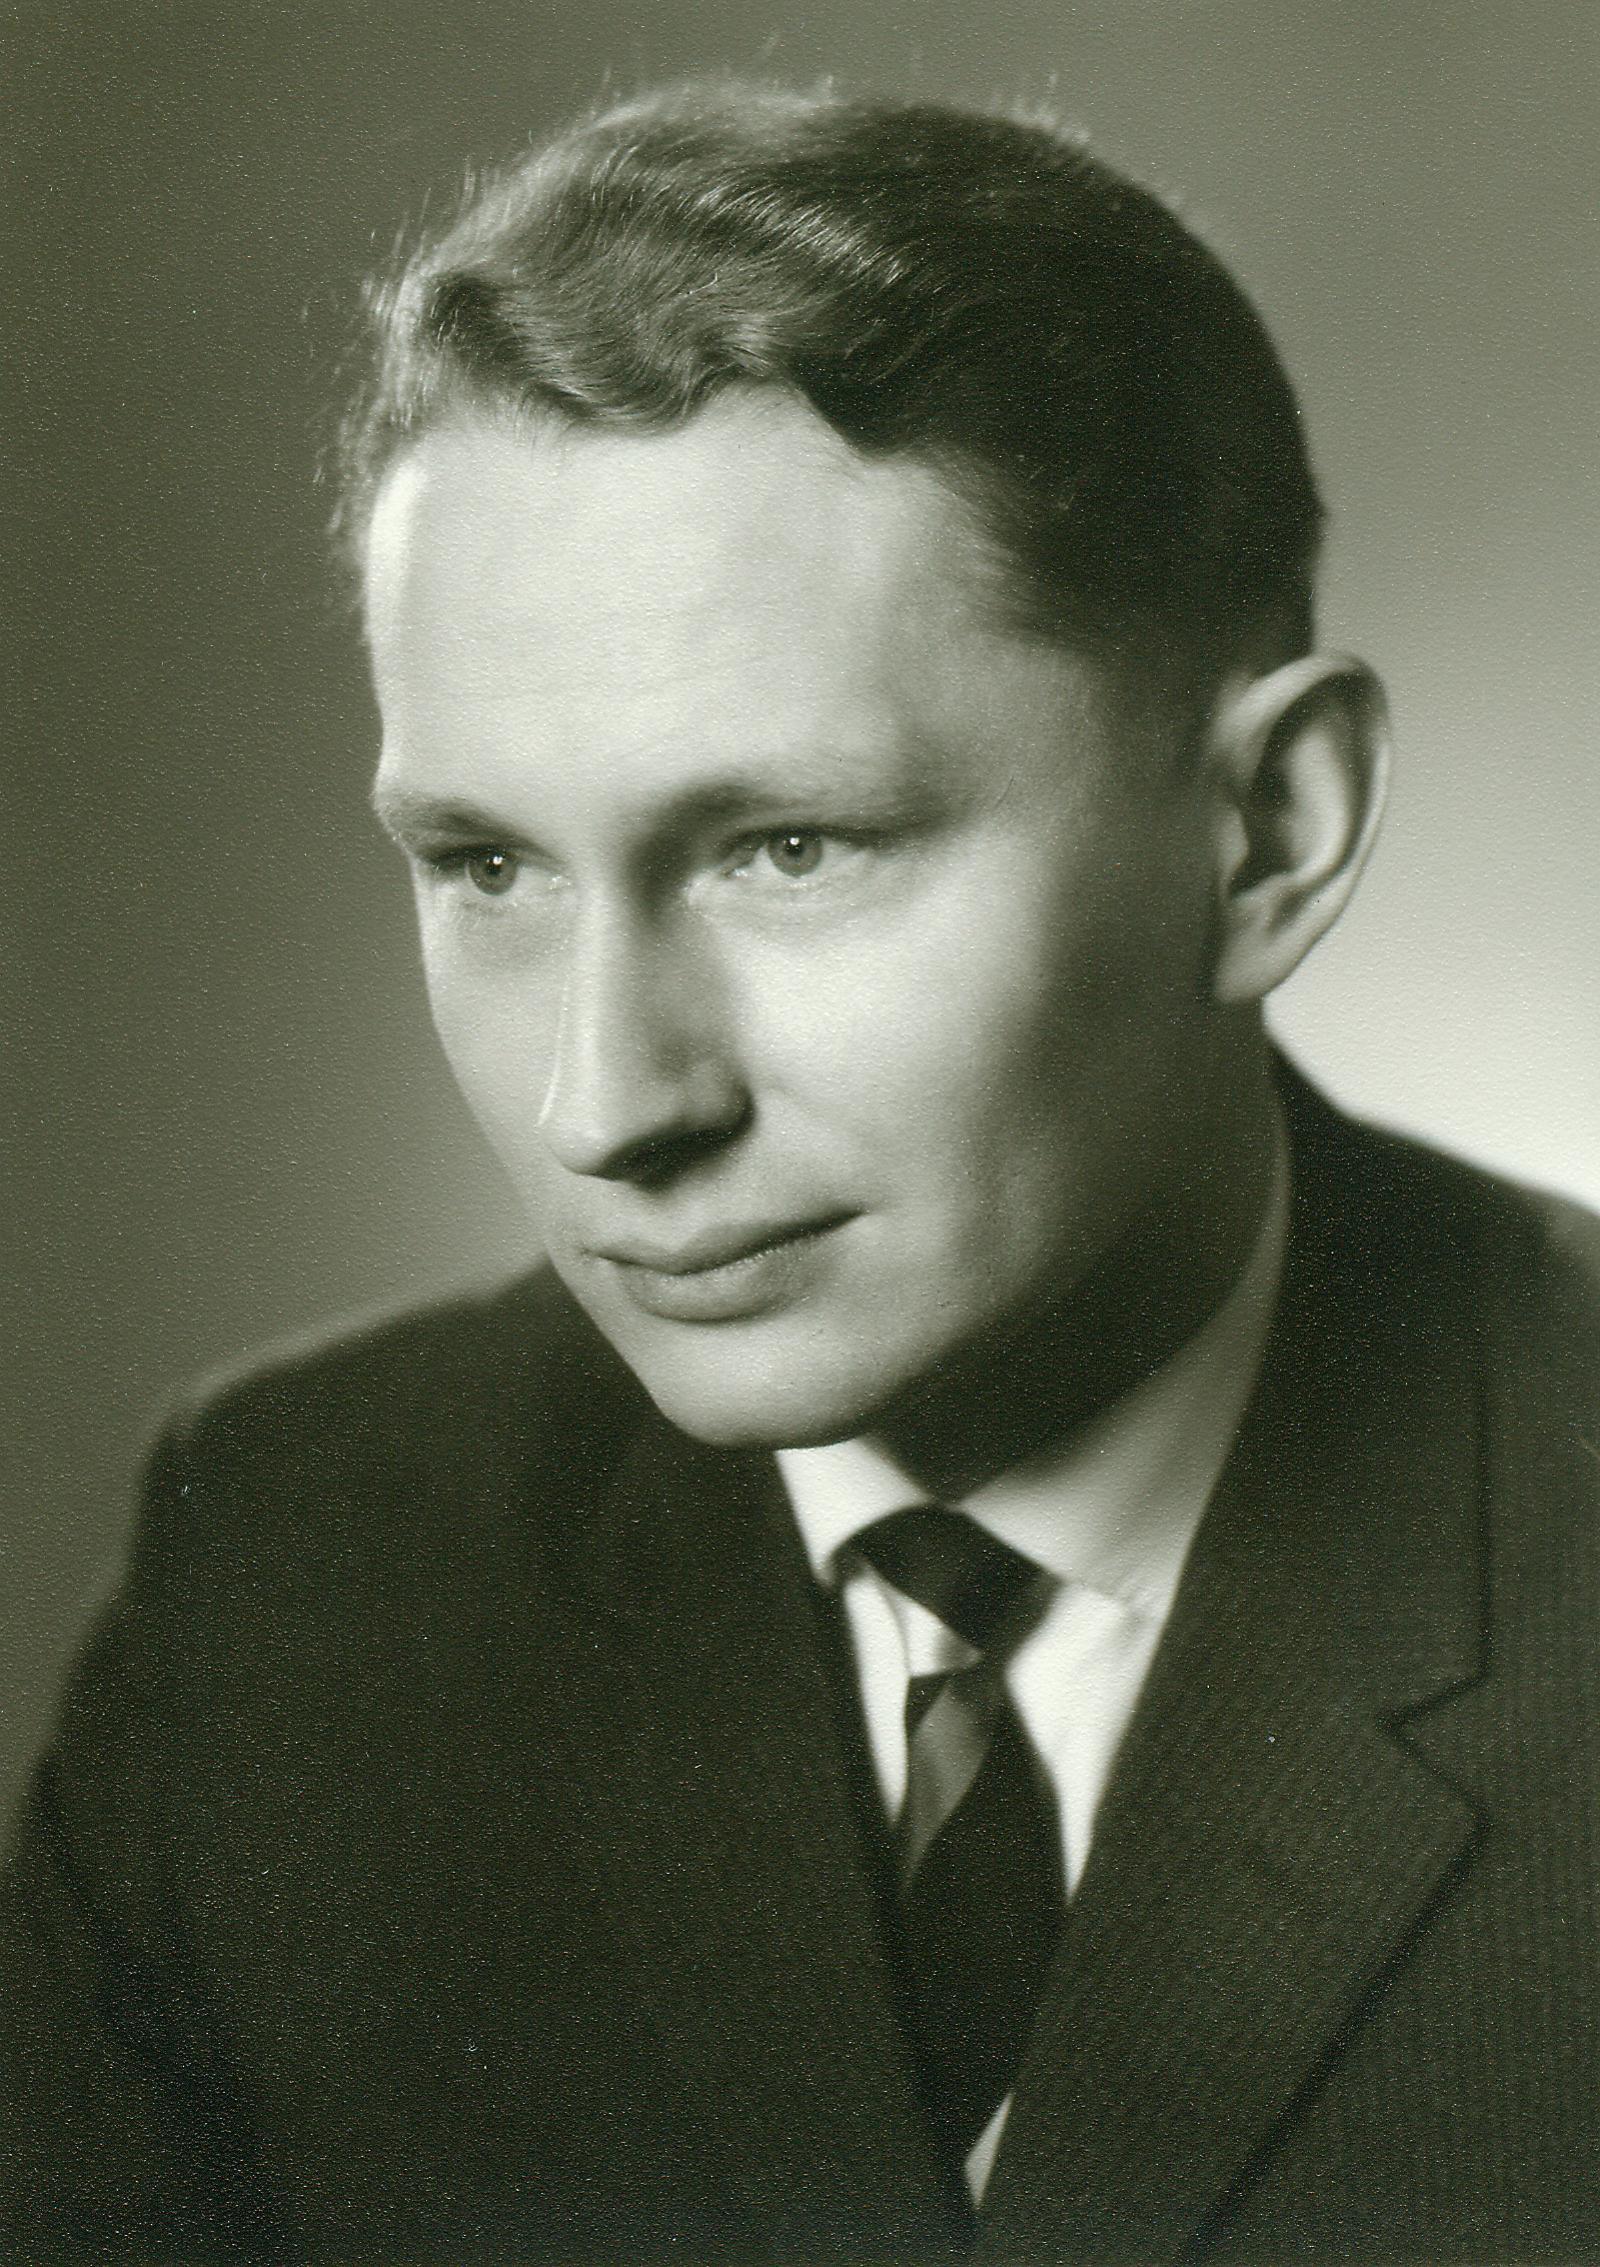 File:Manfred Börner 16 Physiker in Ulm bei Telefunken.jpg